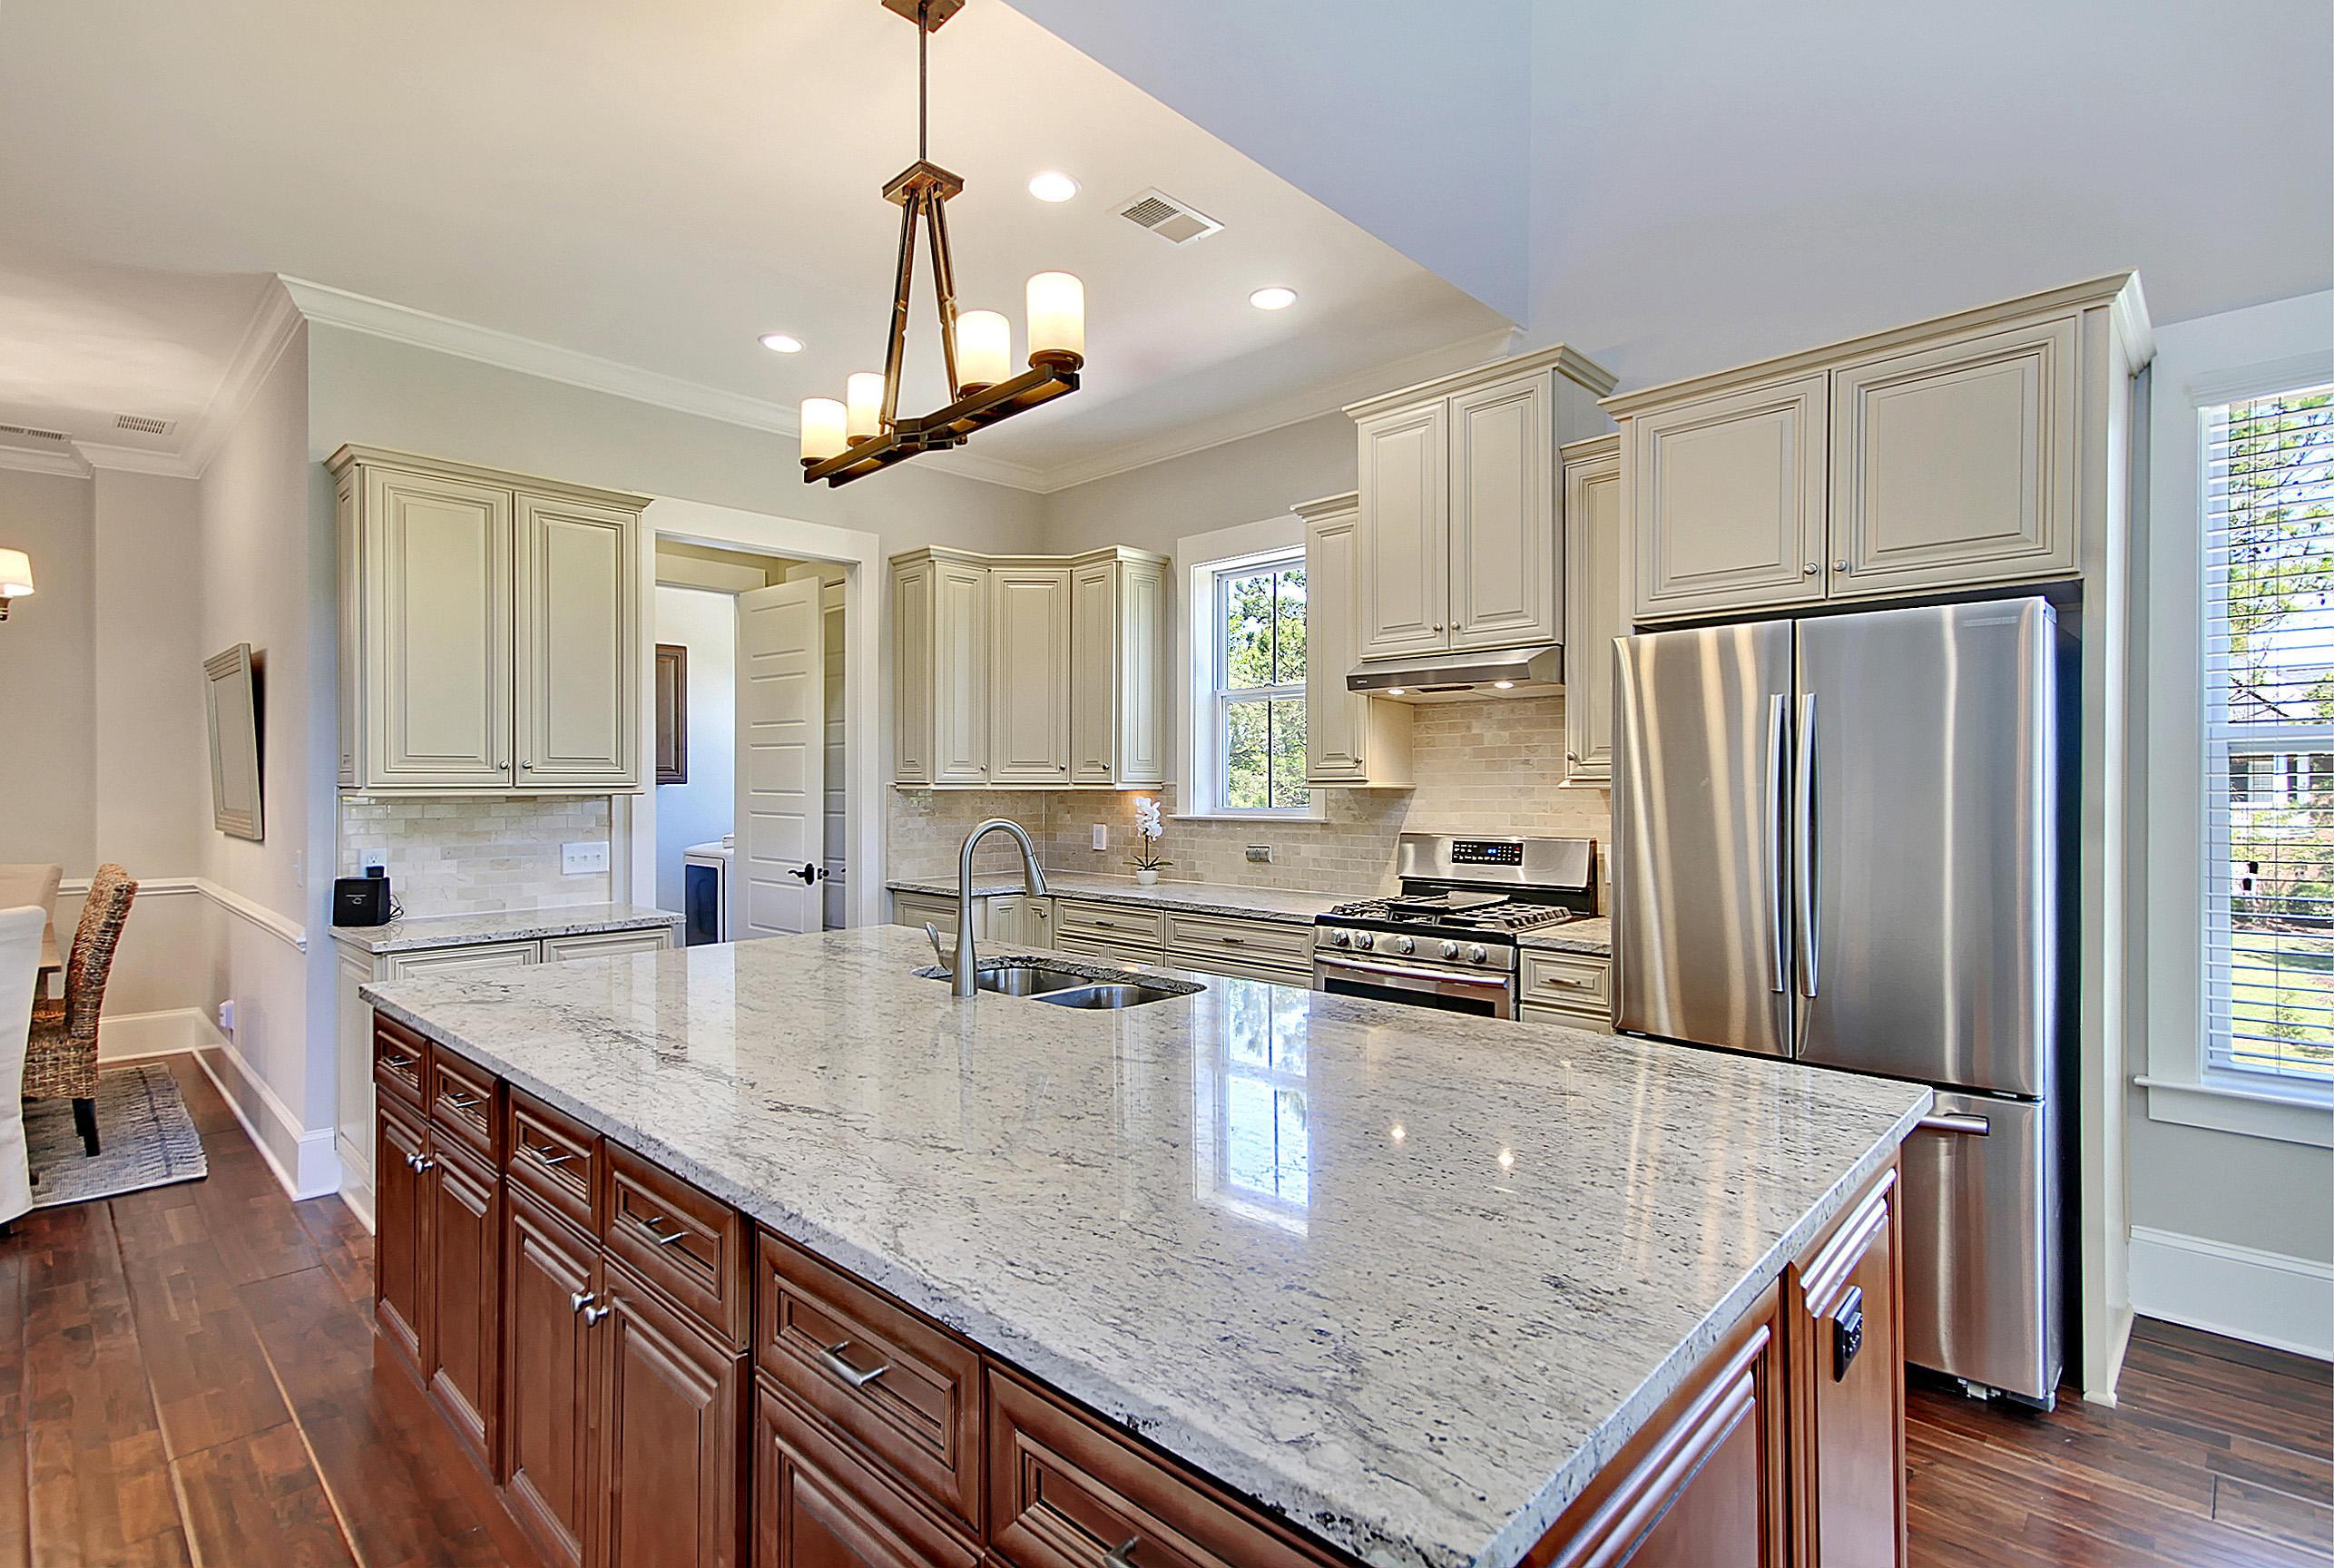 Brickyard Plantation Homes For Sale - 1440 Madison, Mount Pleasant, SC - 52